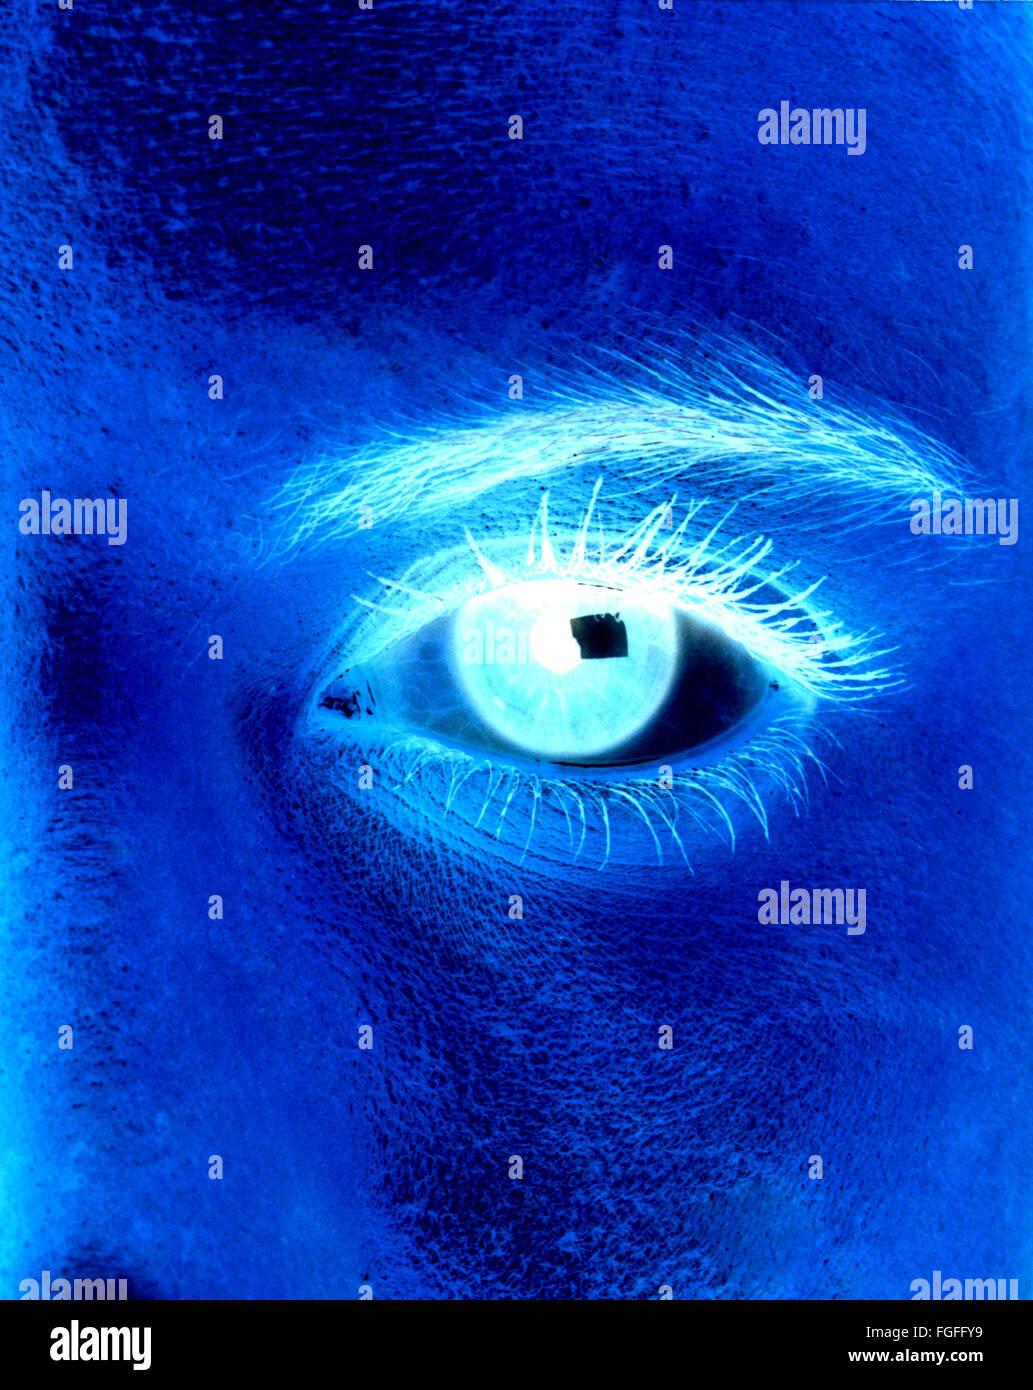 computer generated eye closeup abstract - Stock Image